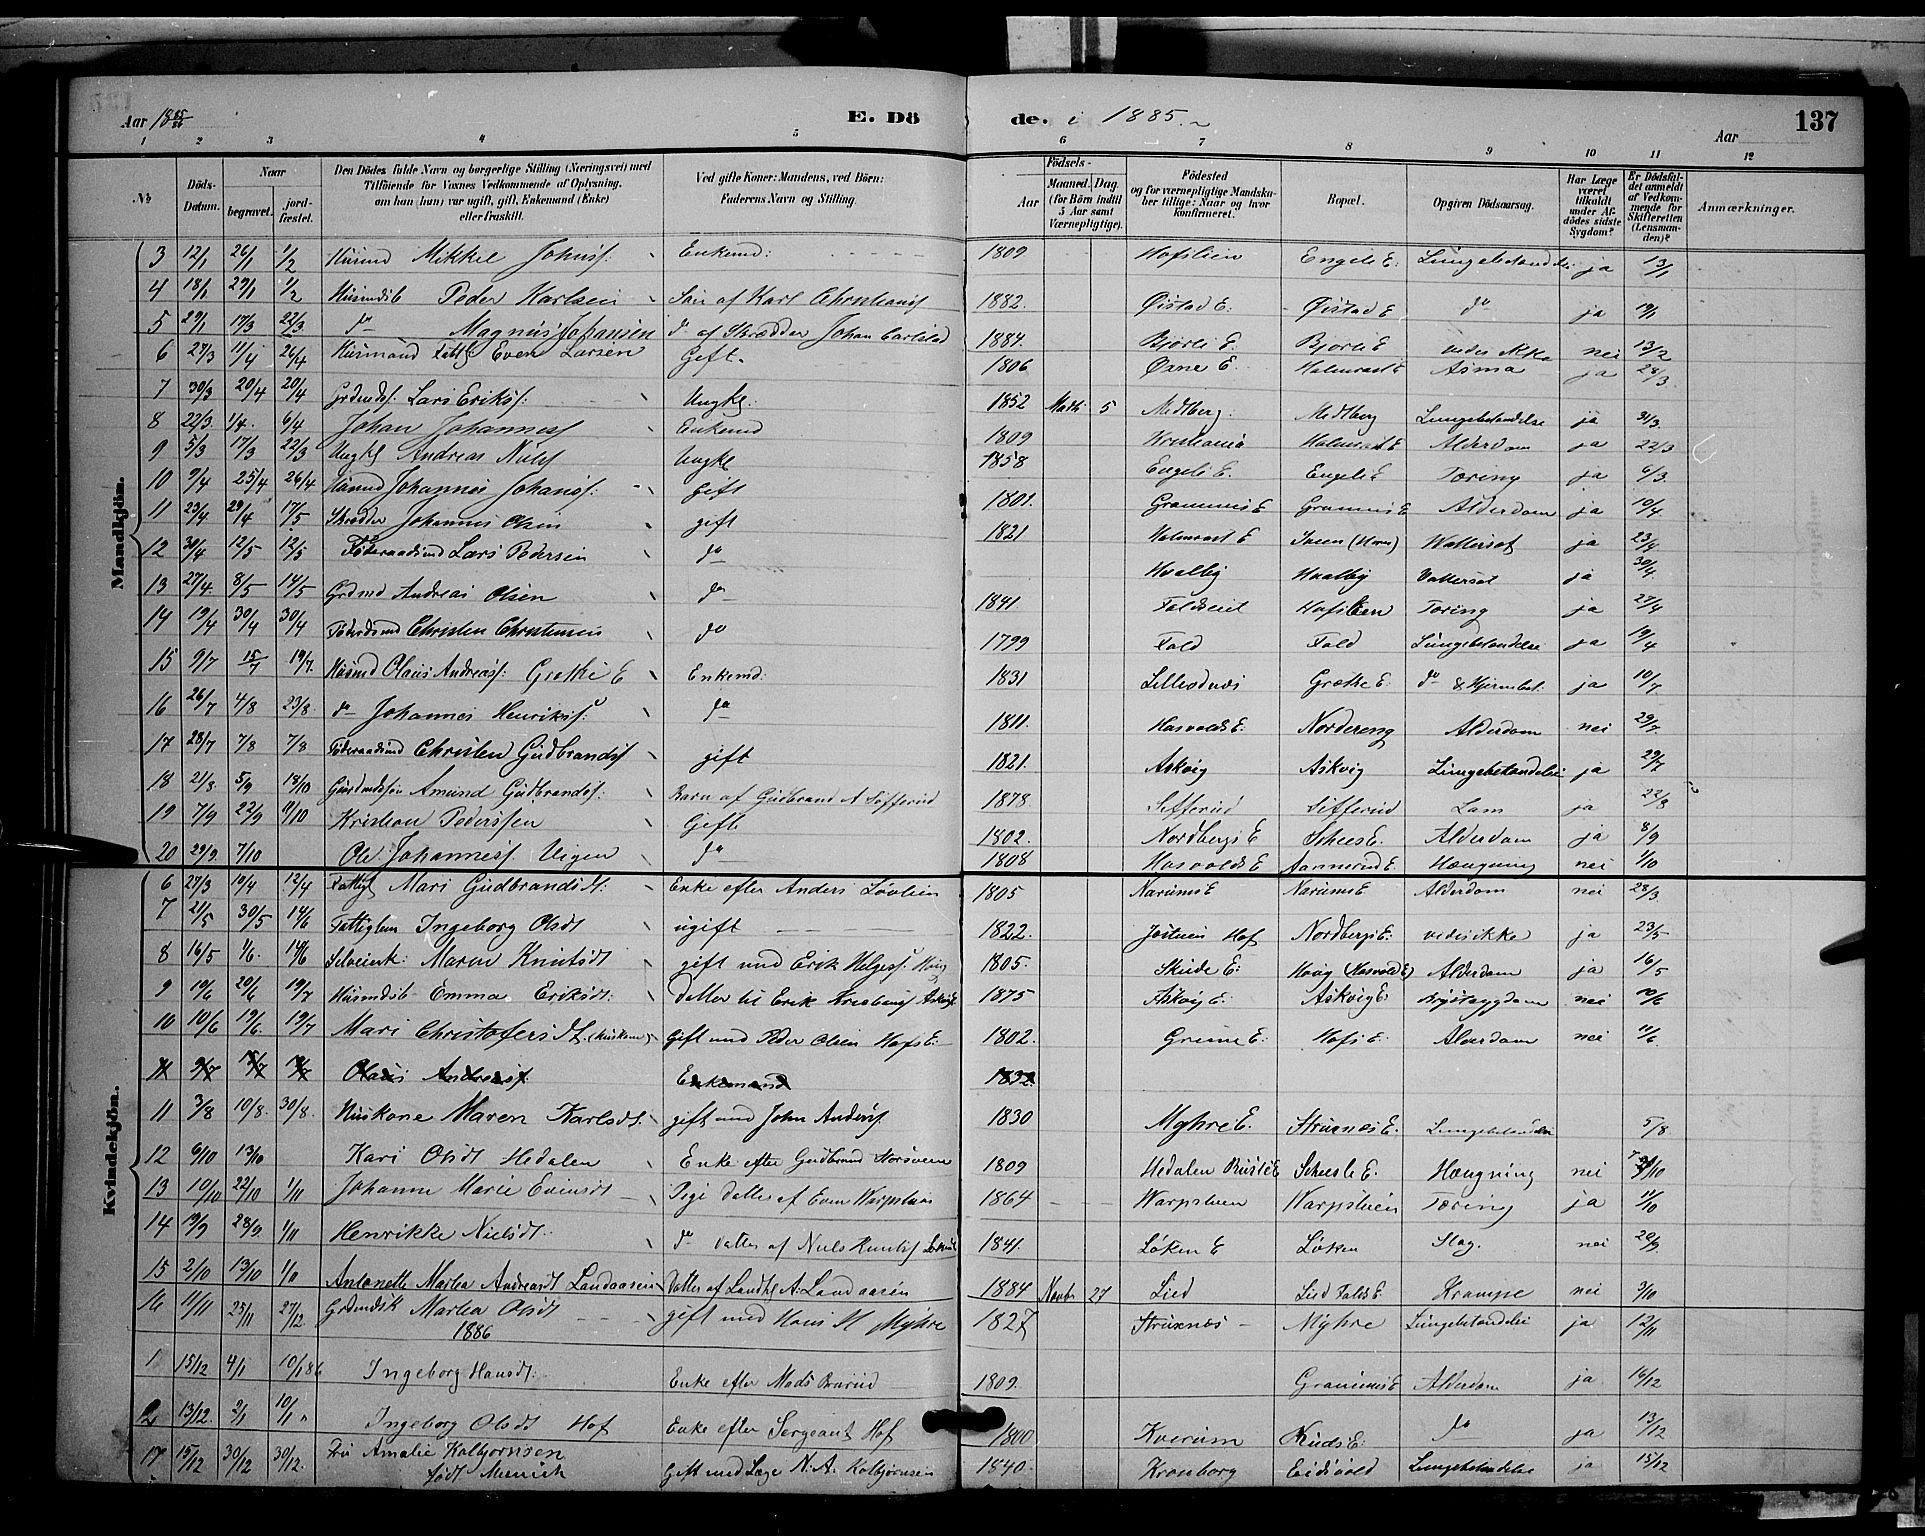 SAH, Søndre Land prestekontor, L/L0002: Klokkerbok nr. 2, 1884-1900, s. 137